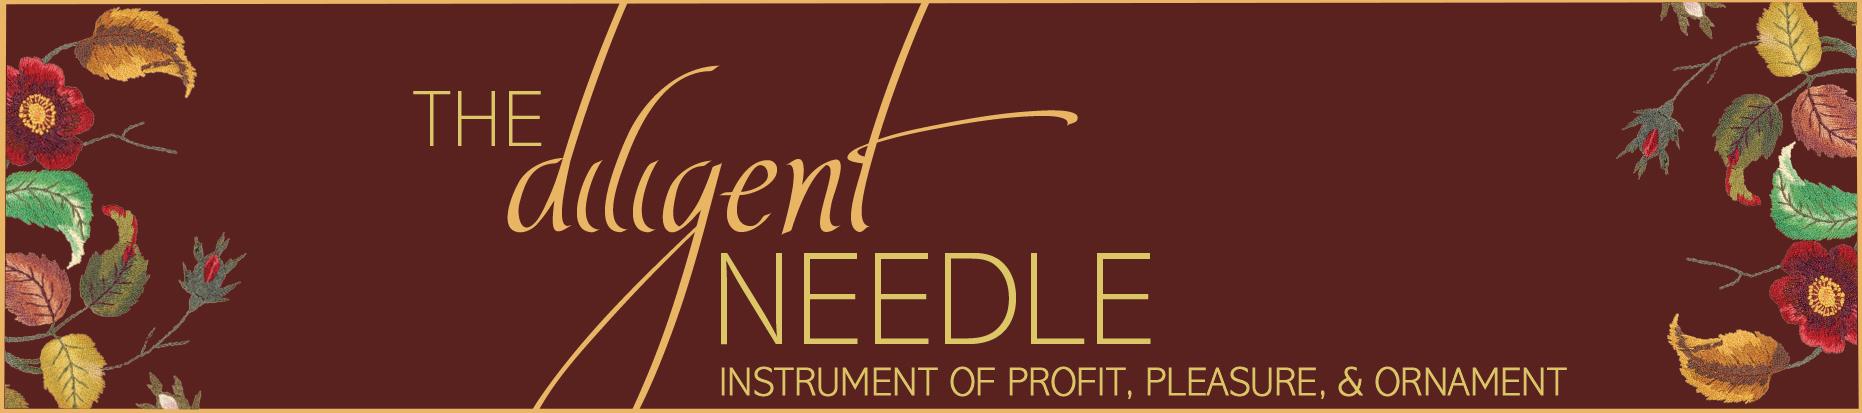 The Diligent Needle